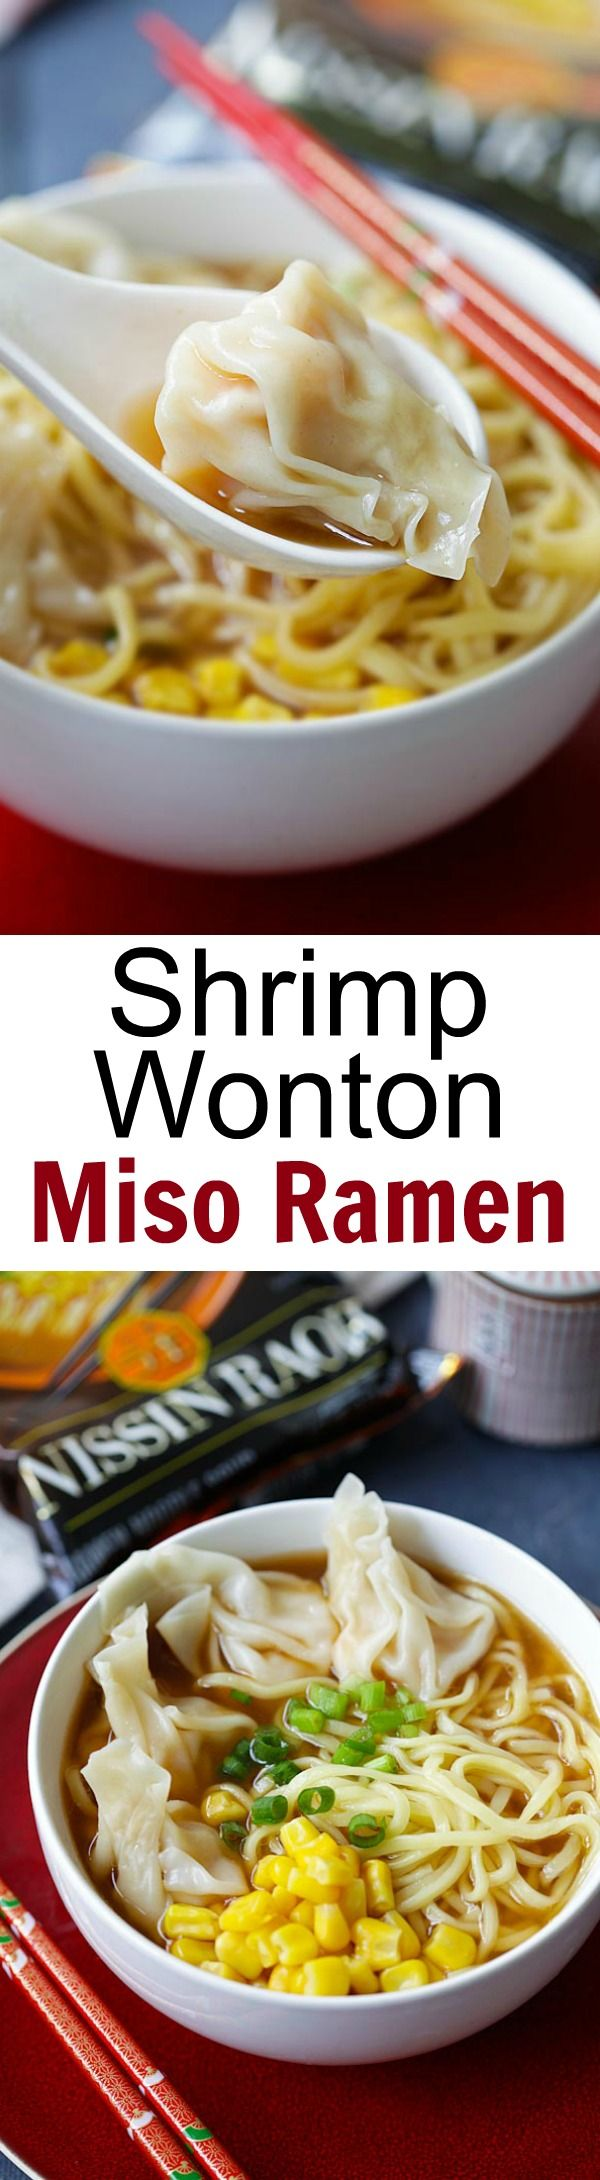 Shrimp Wonton Miso Ramen - restaurant-quality miso ramen with juicy and plump shrimp wontons, made with Nissin RAOH ramen, SO GOOD! | rasamalaysia.com